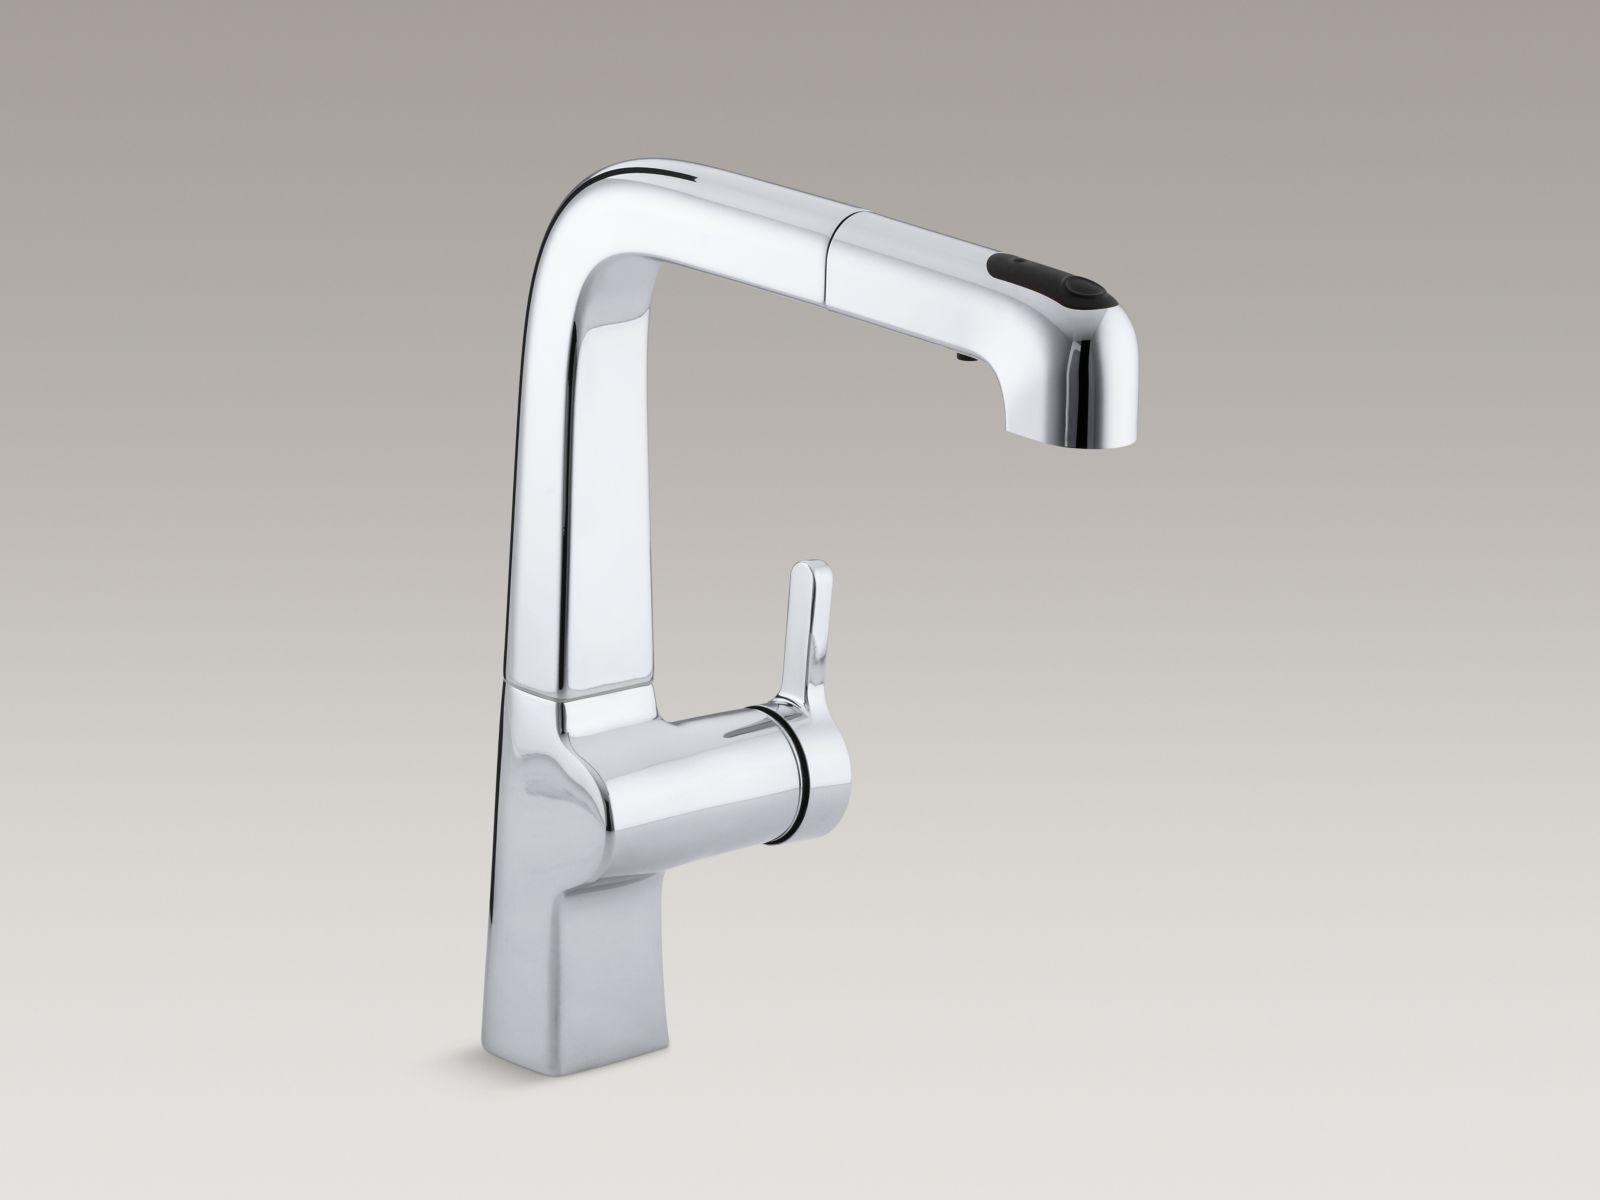 kohler evoke bar faucet kohler evoke bar faucet buyplumbing category bar prep faucet 1600 x 1200